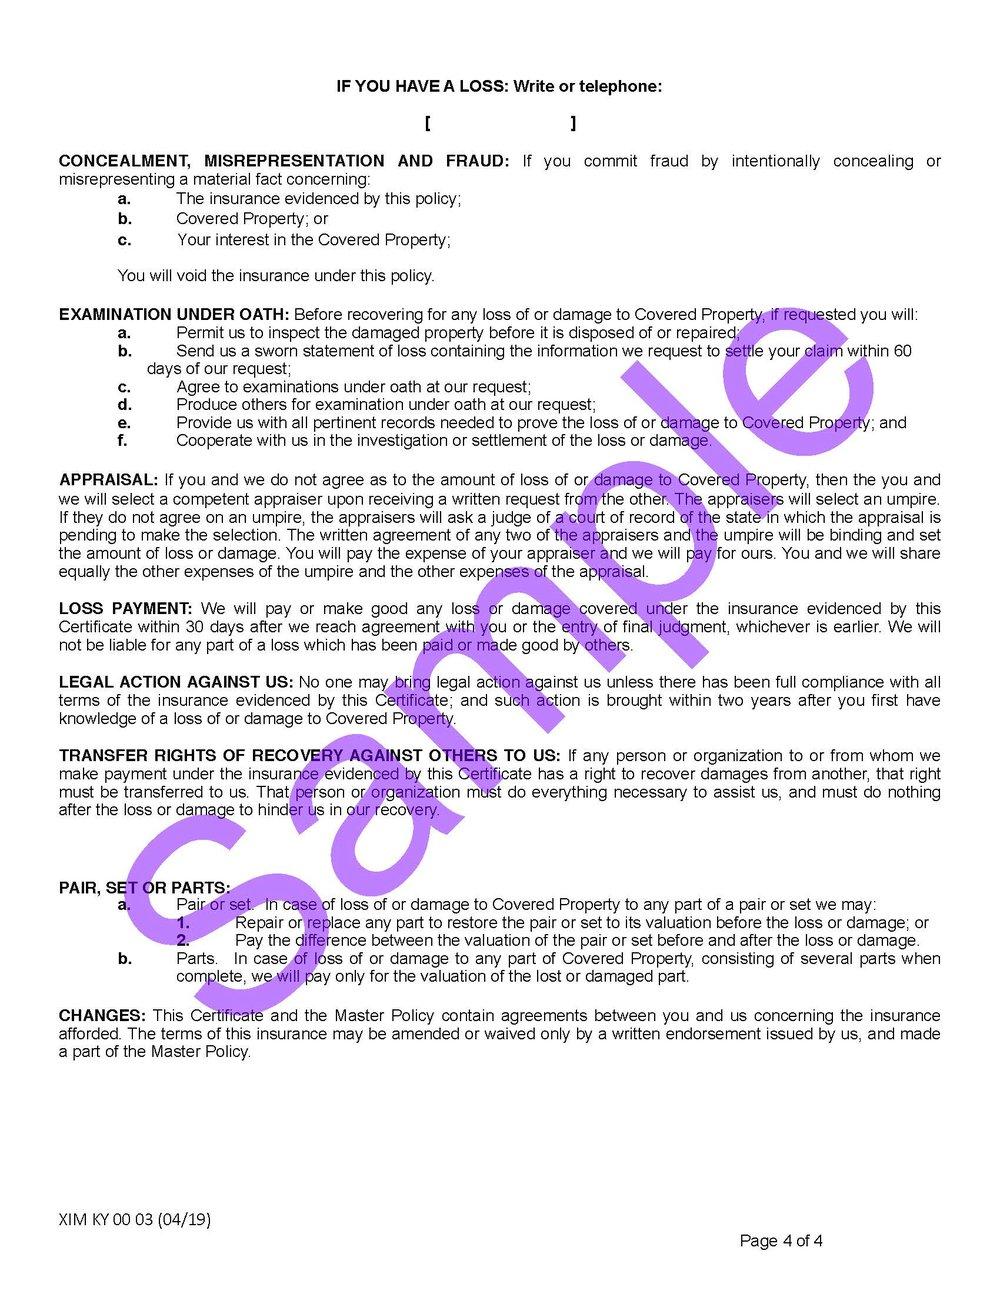 XIM KY 00 03 04 19 Kentucky Certificate of InsuranceSample_Page_4.jpg